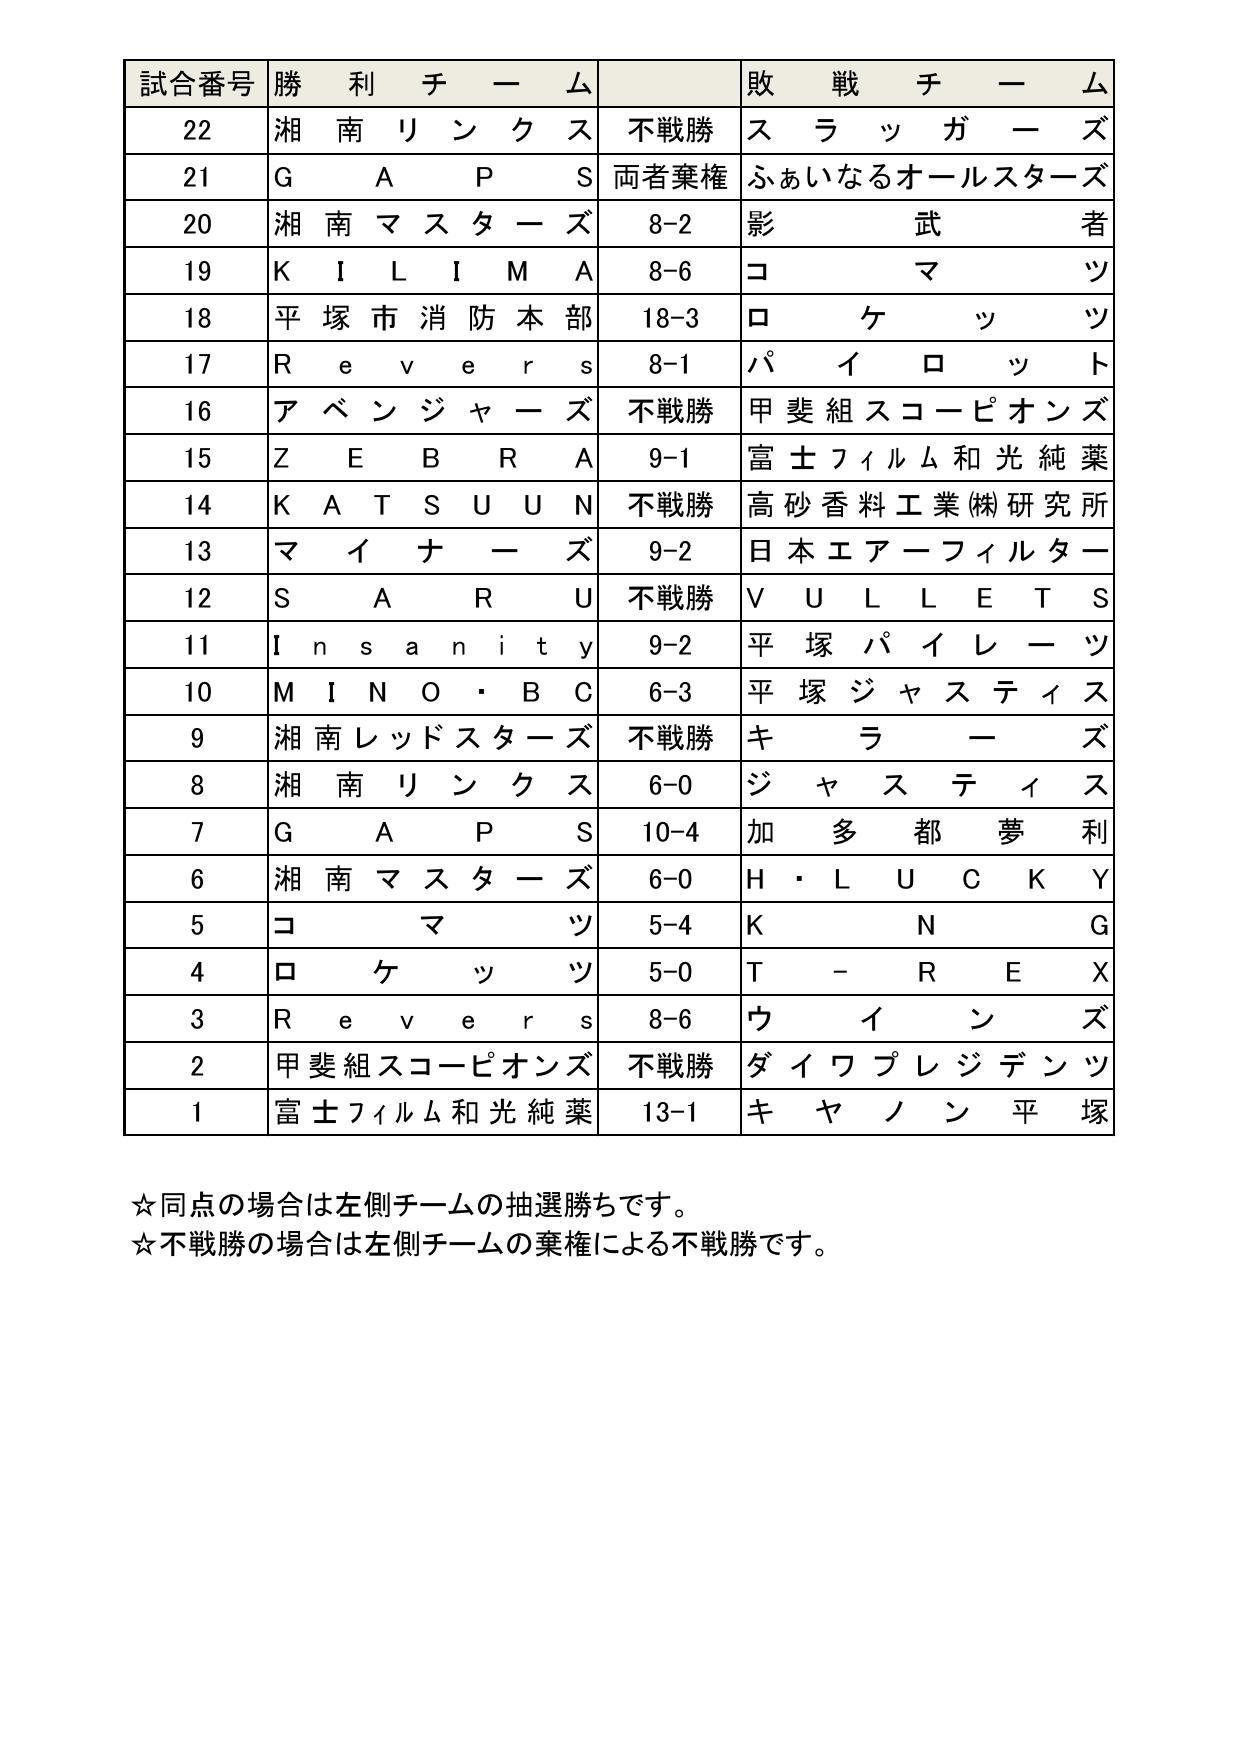 19sp_2.jpg